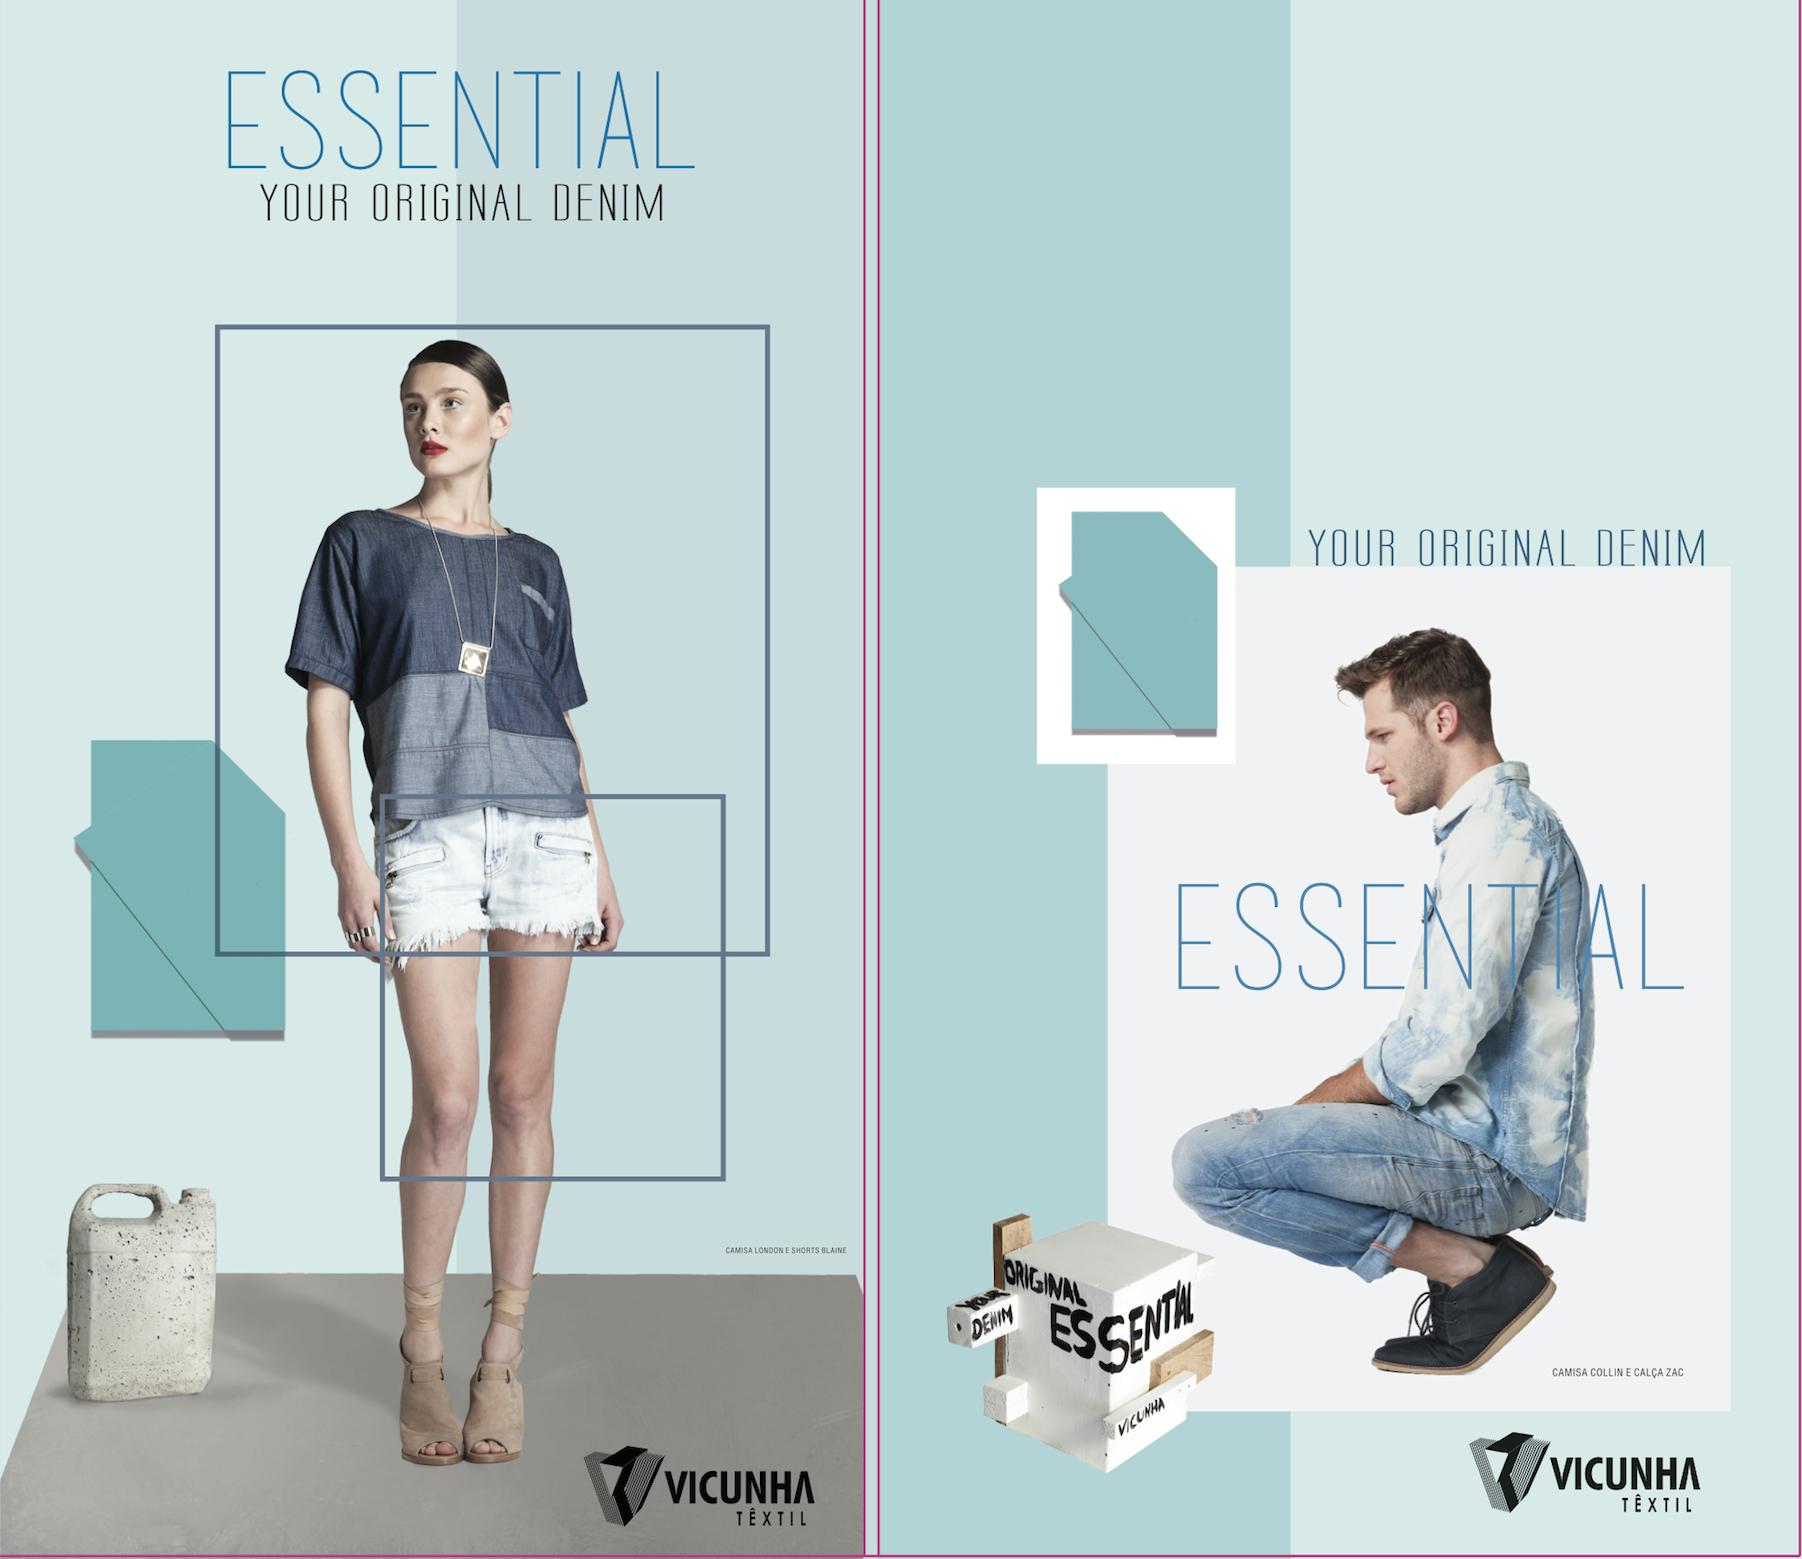 03_essential_book1_copy.jpg